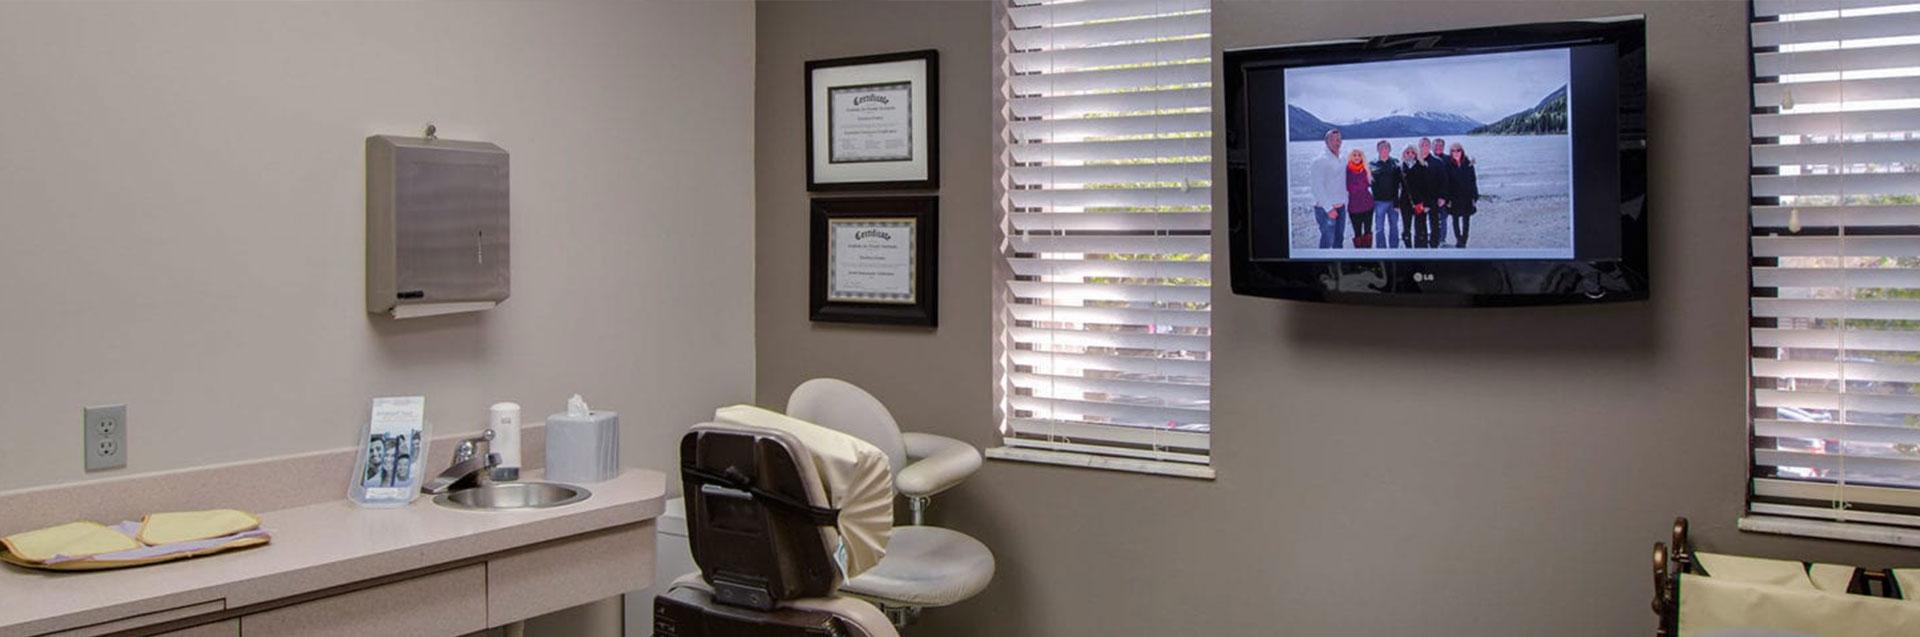 Gentle Dentistry Tampa office